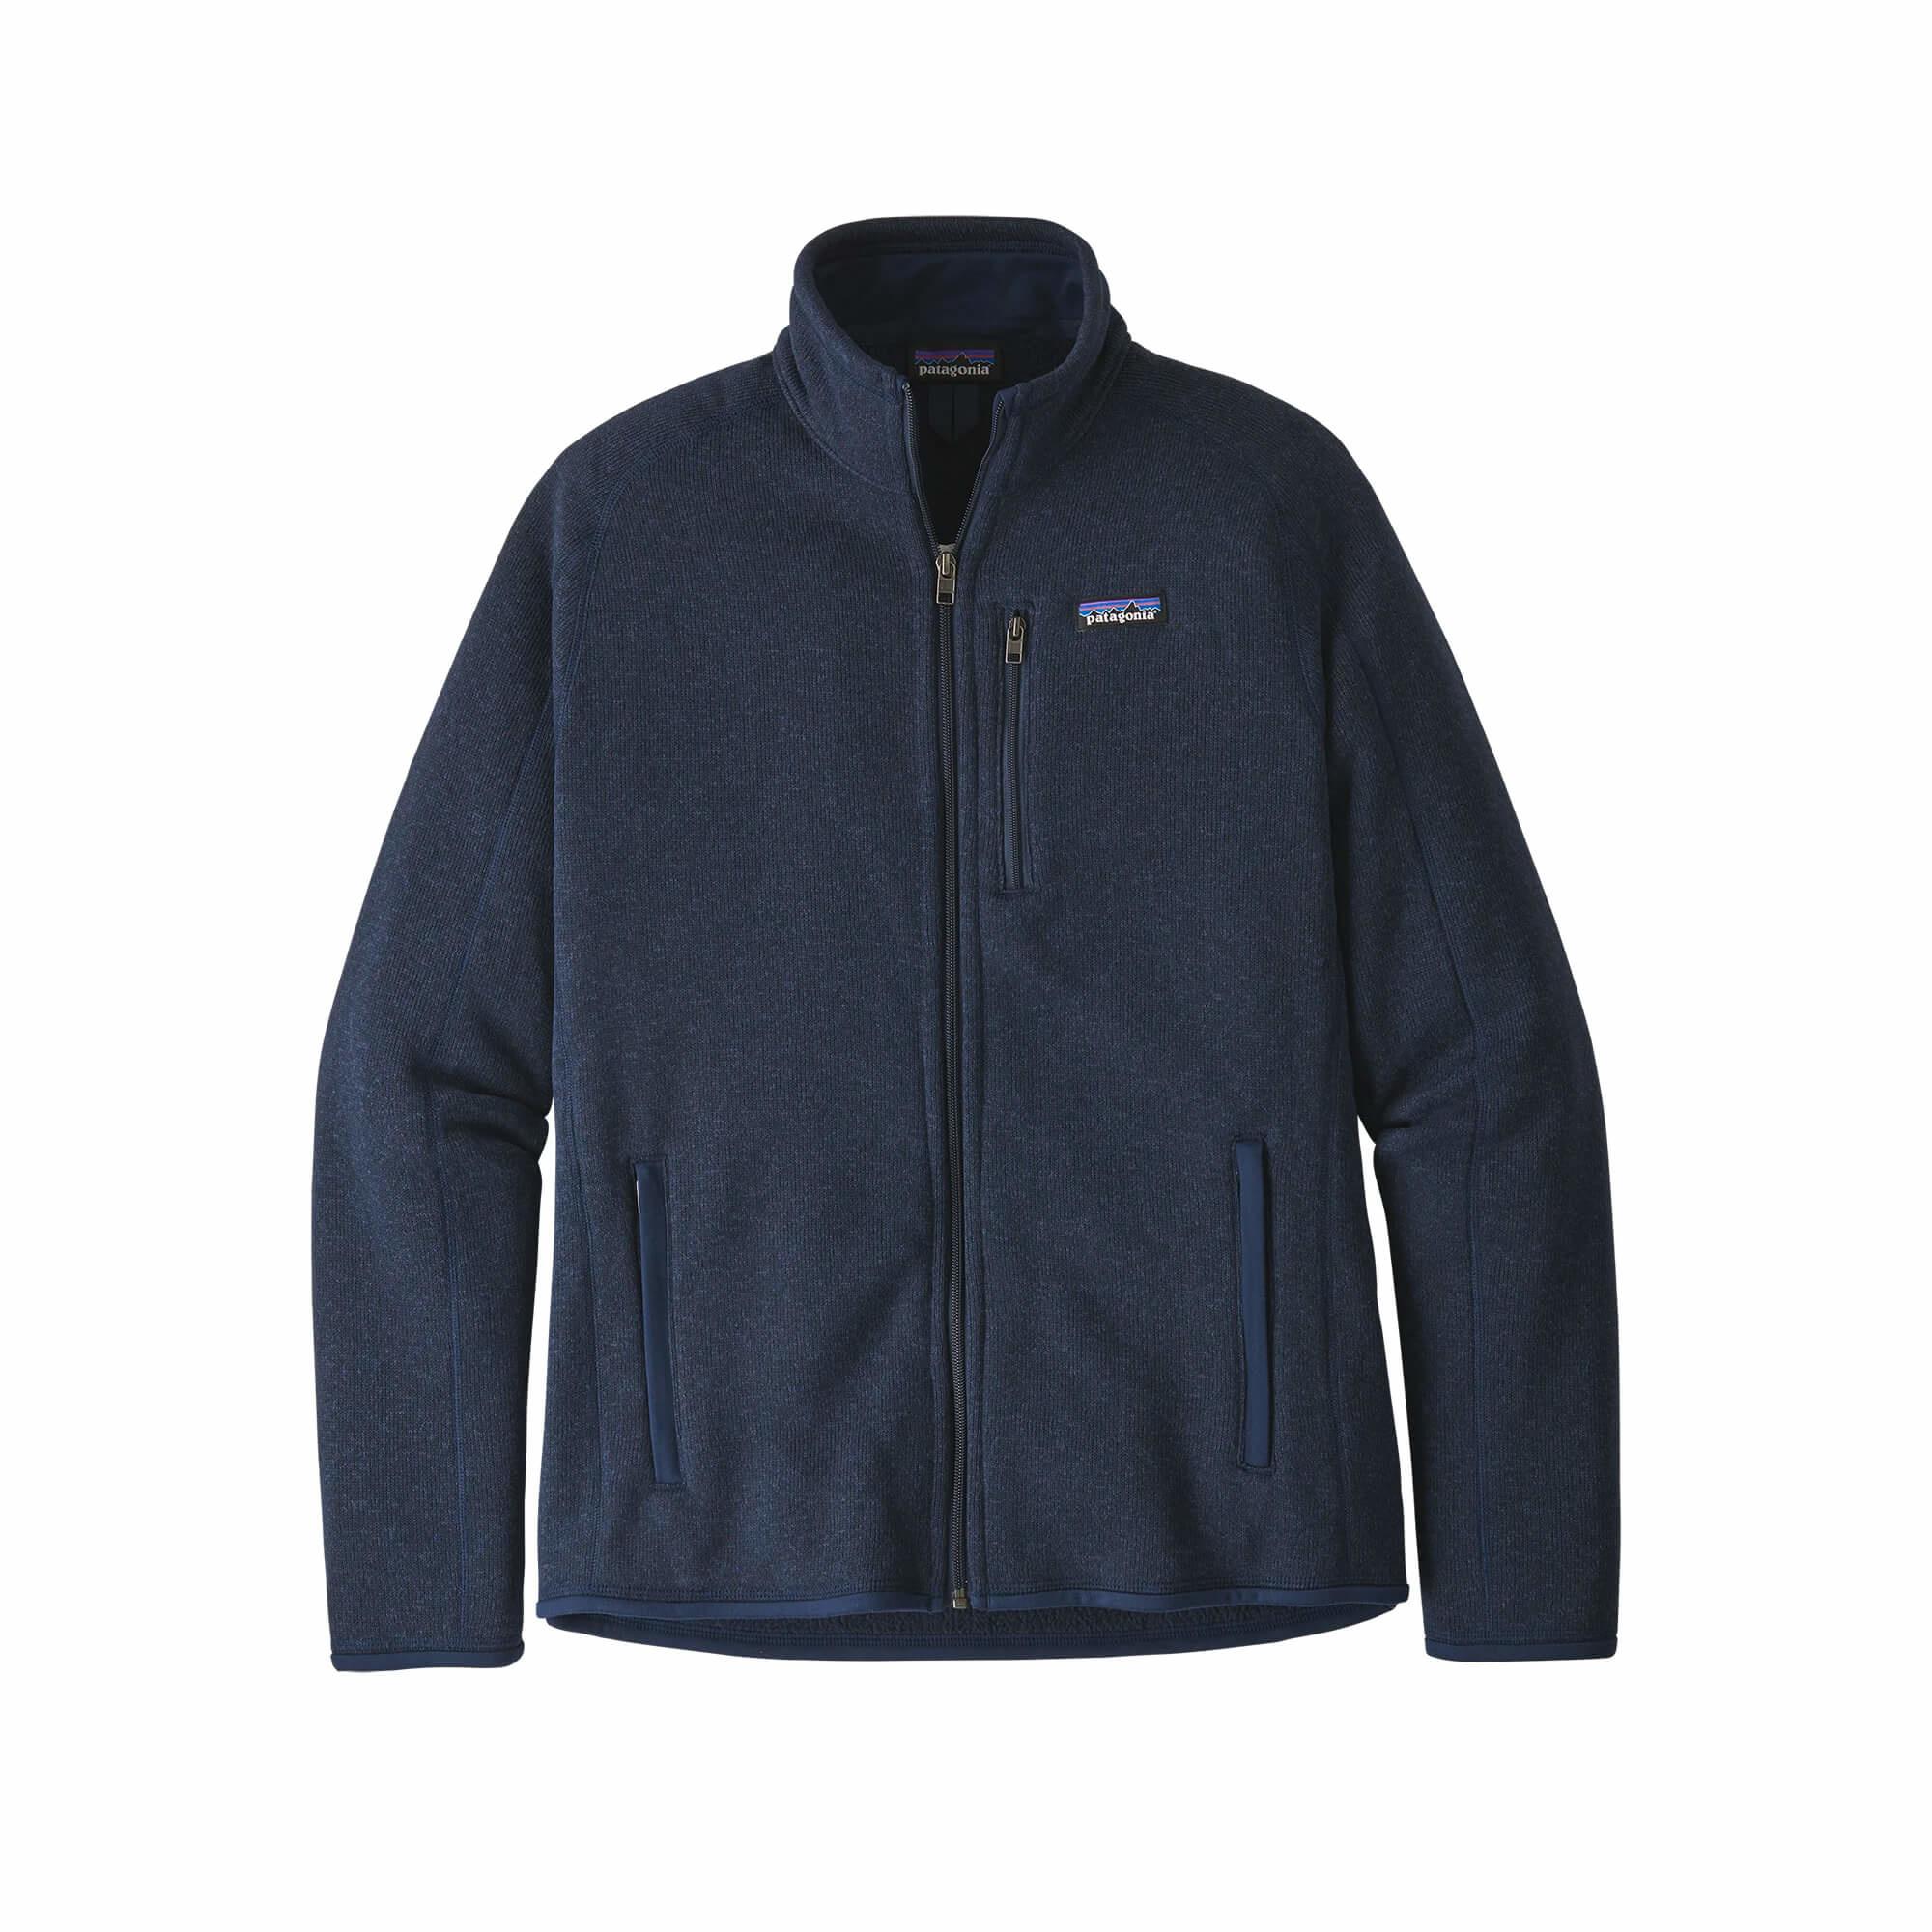 Men's Better Sweater Jacket-1